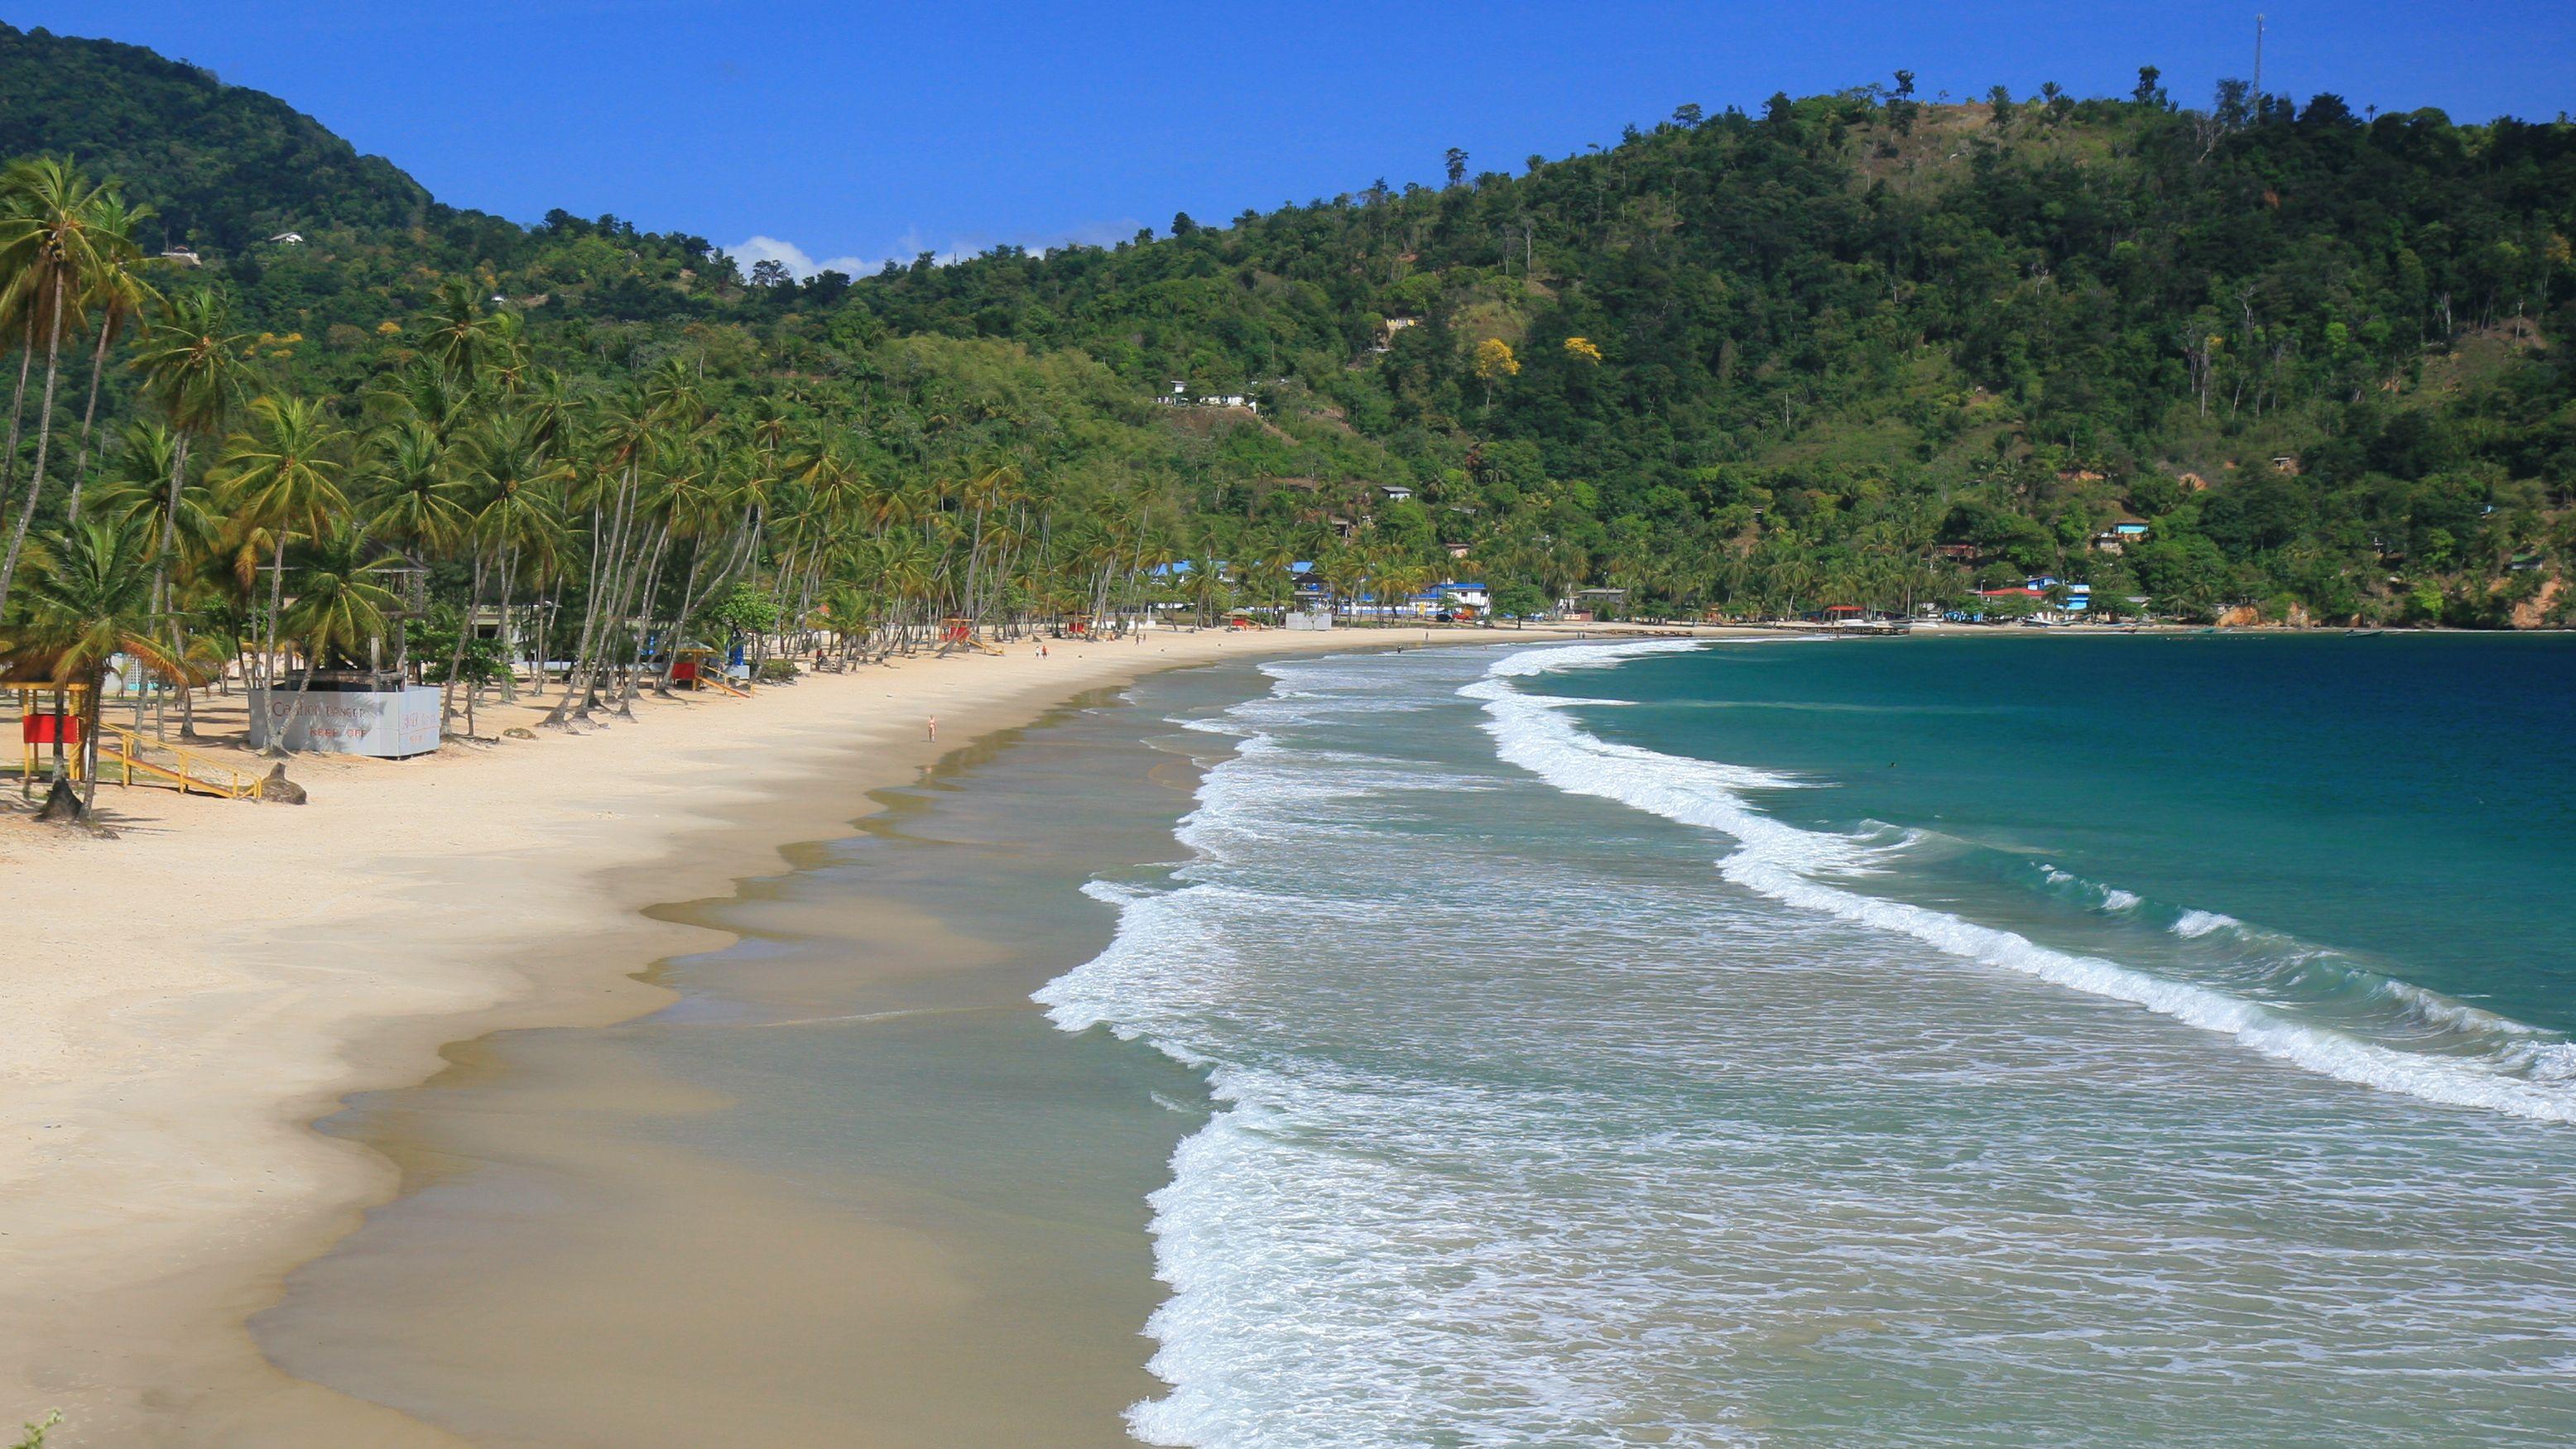 Beaches of Trinidad and Tobago